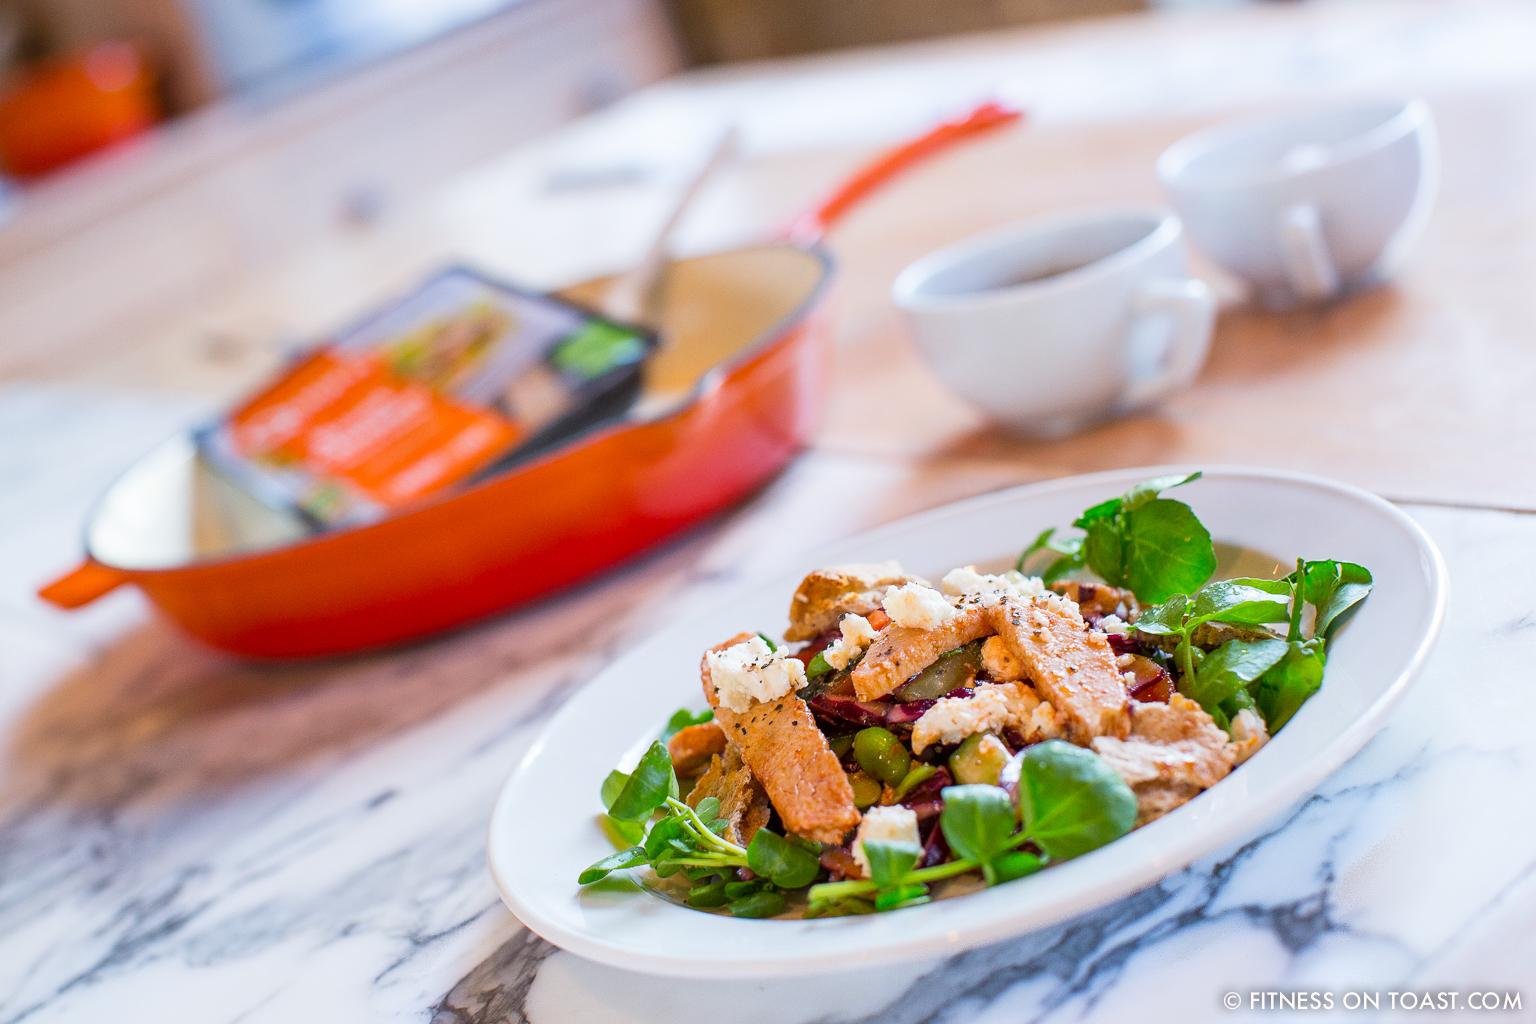 Fitness On Toast Faya Blog Girl Healthy Recipe Nutrition Quorn Protein Collaboration Fatoush Salad Main-19